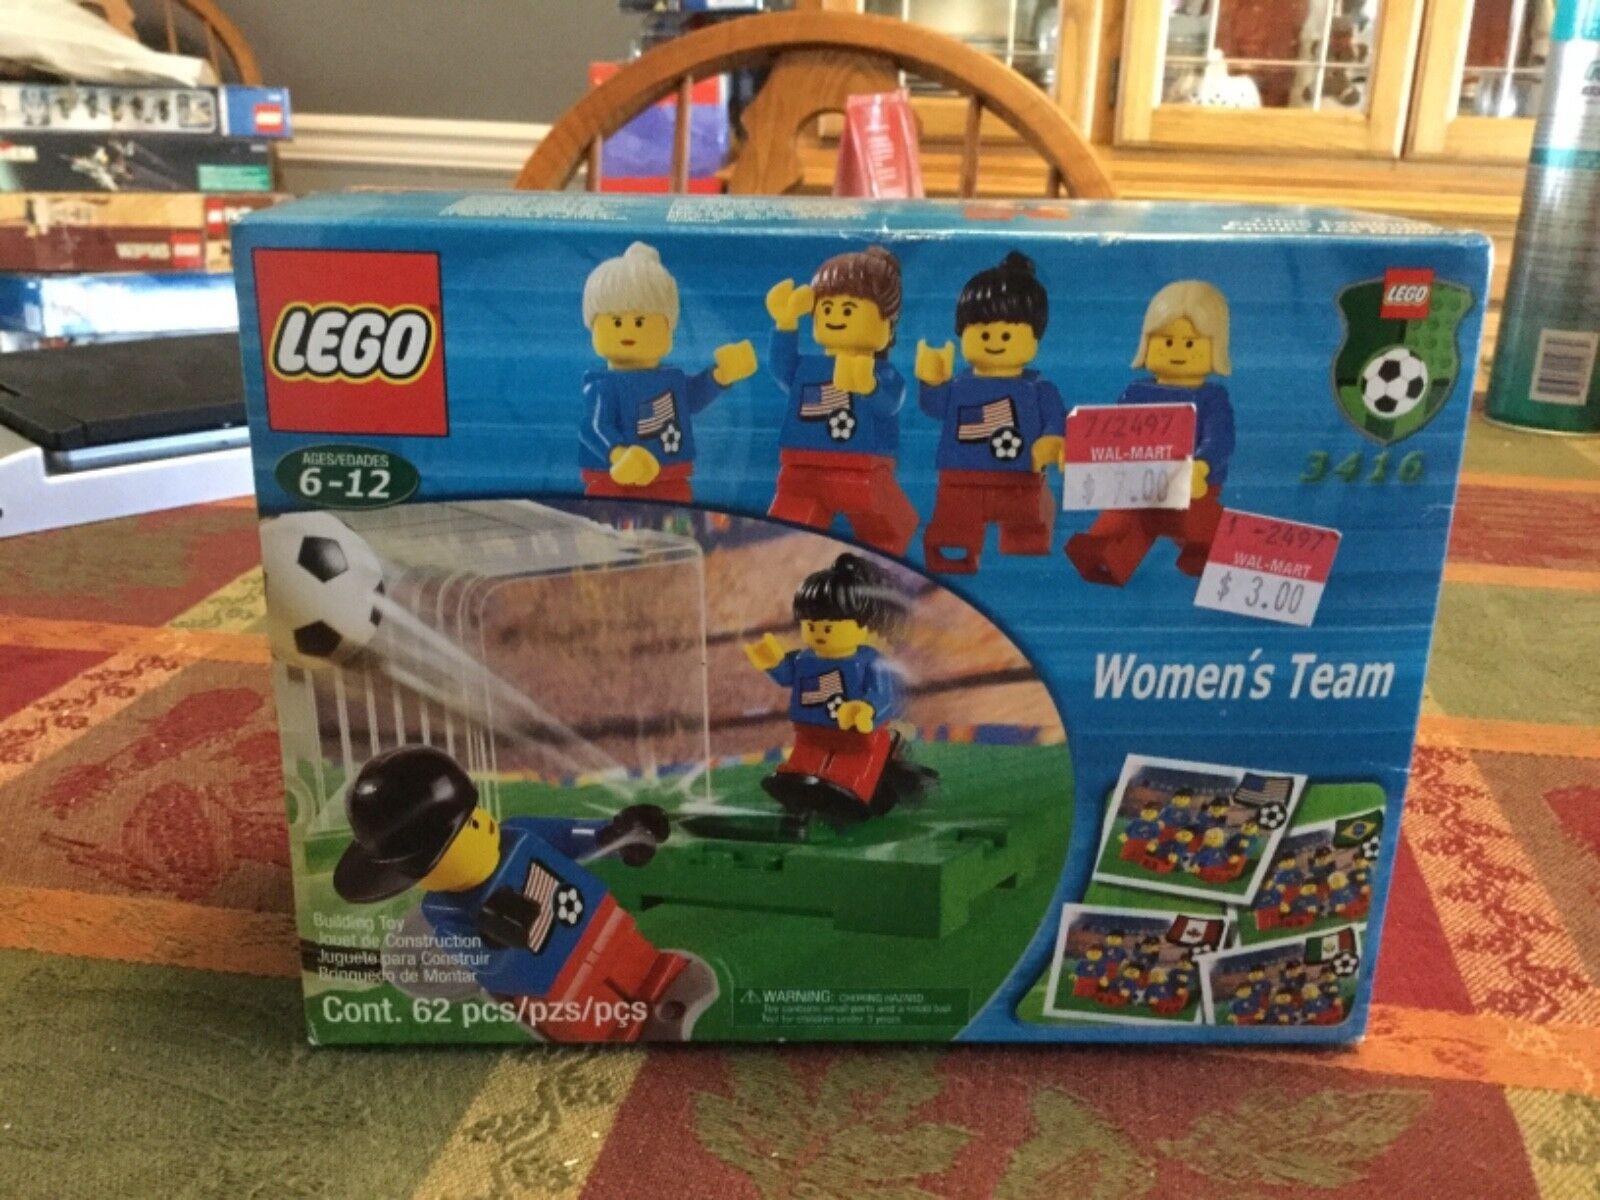 BRAND NEW  FACTORY SEALED  Lego SPORTS SOCCER 3416 WOMEN'S TEAM